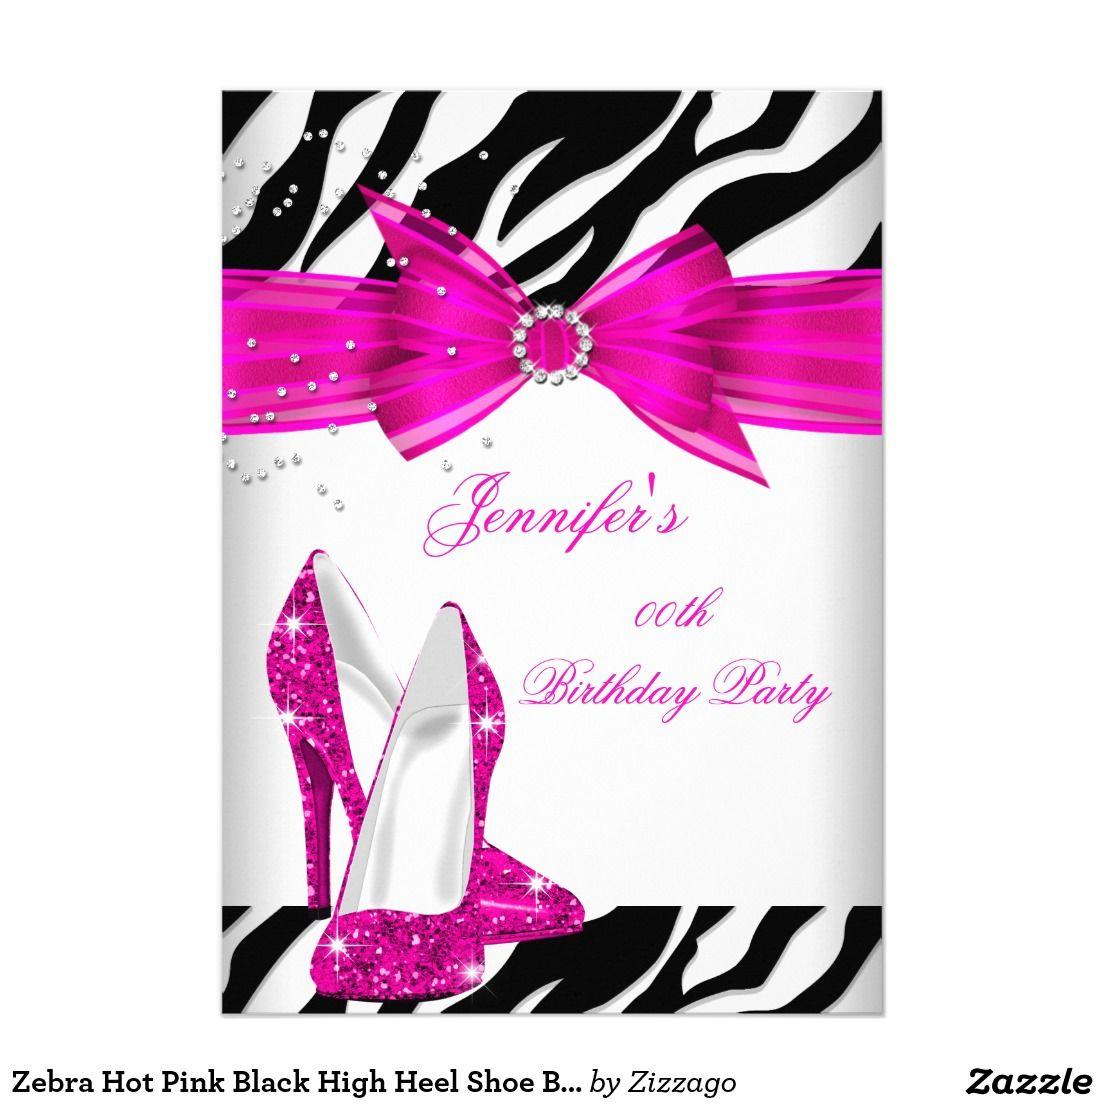 Zebra Hot Pink Black High Heel Shoe Birthday Party Invitation ...